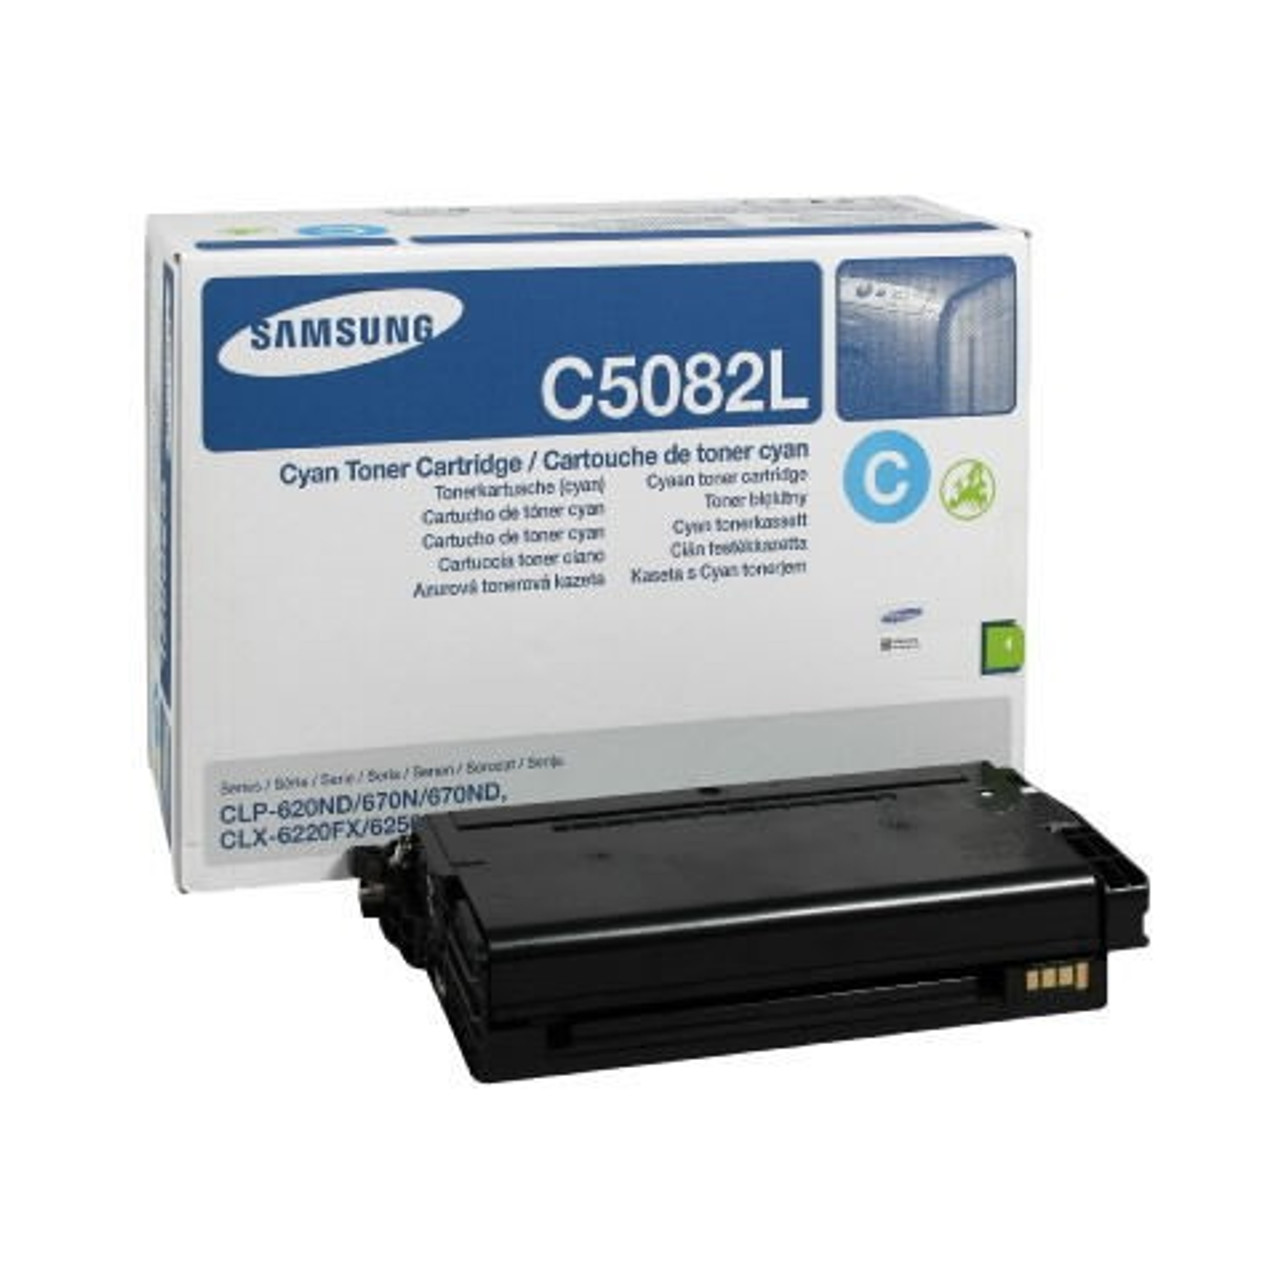 High Capacity Samsung Cltc5082l Original Cyan Toner Cartridge (Clt-c5082l Laser Printer Cartridge)